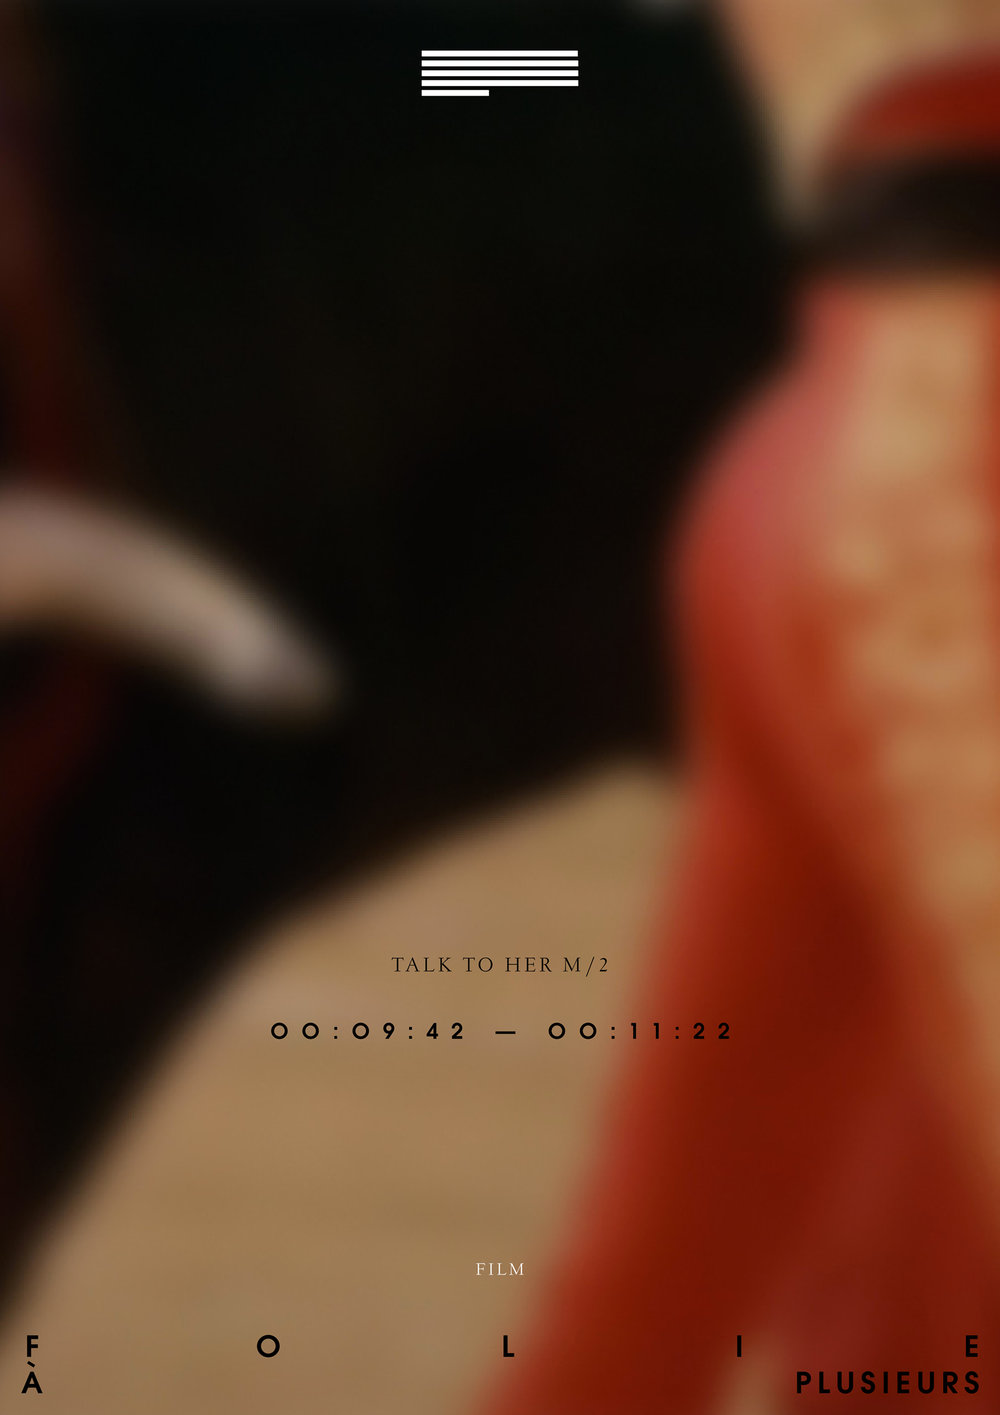 Folie-A-Plusieurs-Talk-To-Her-1-Perfume.jpg